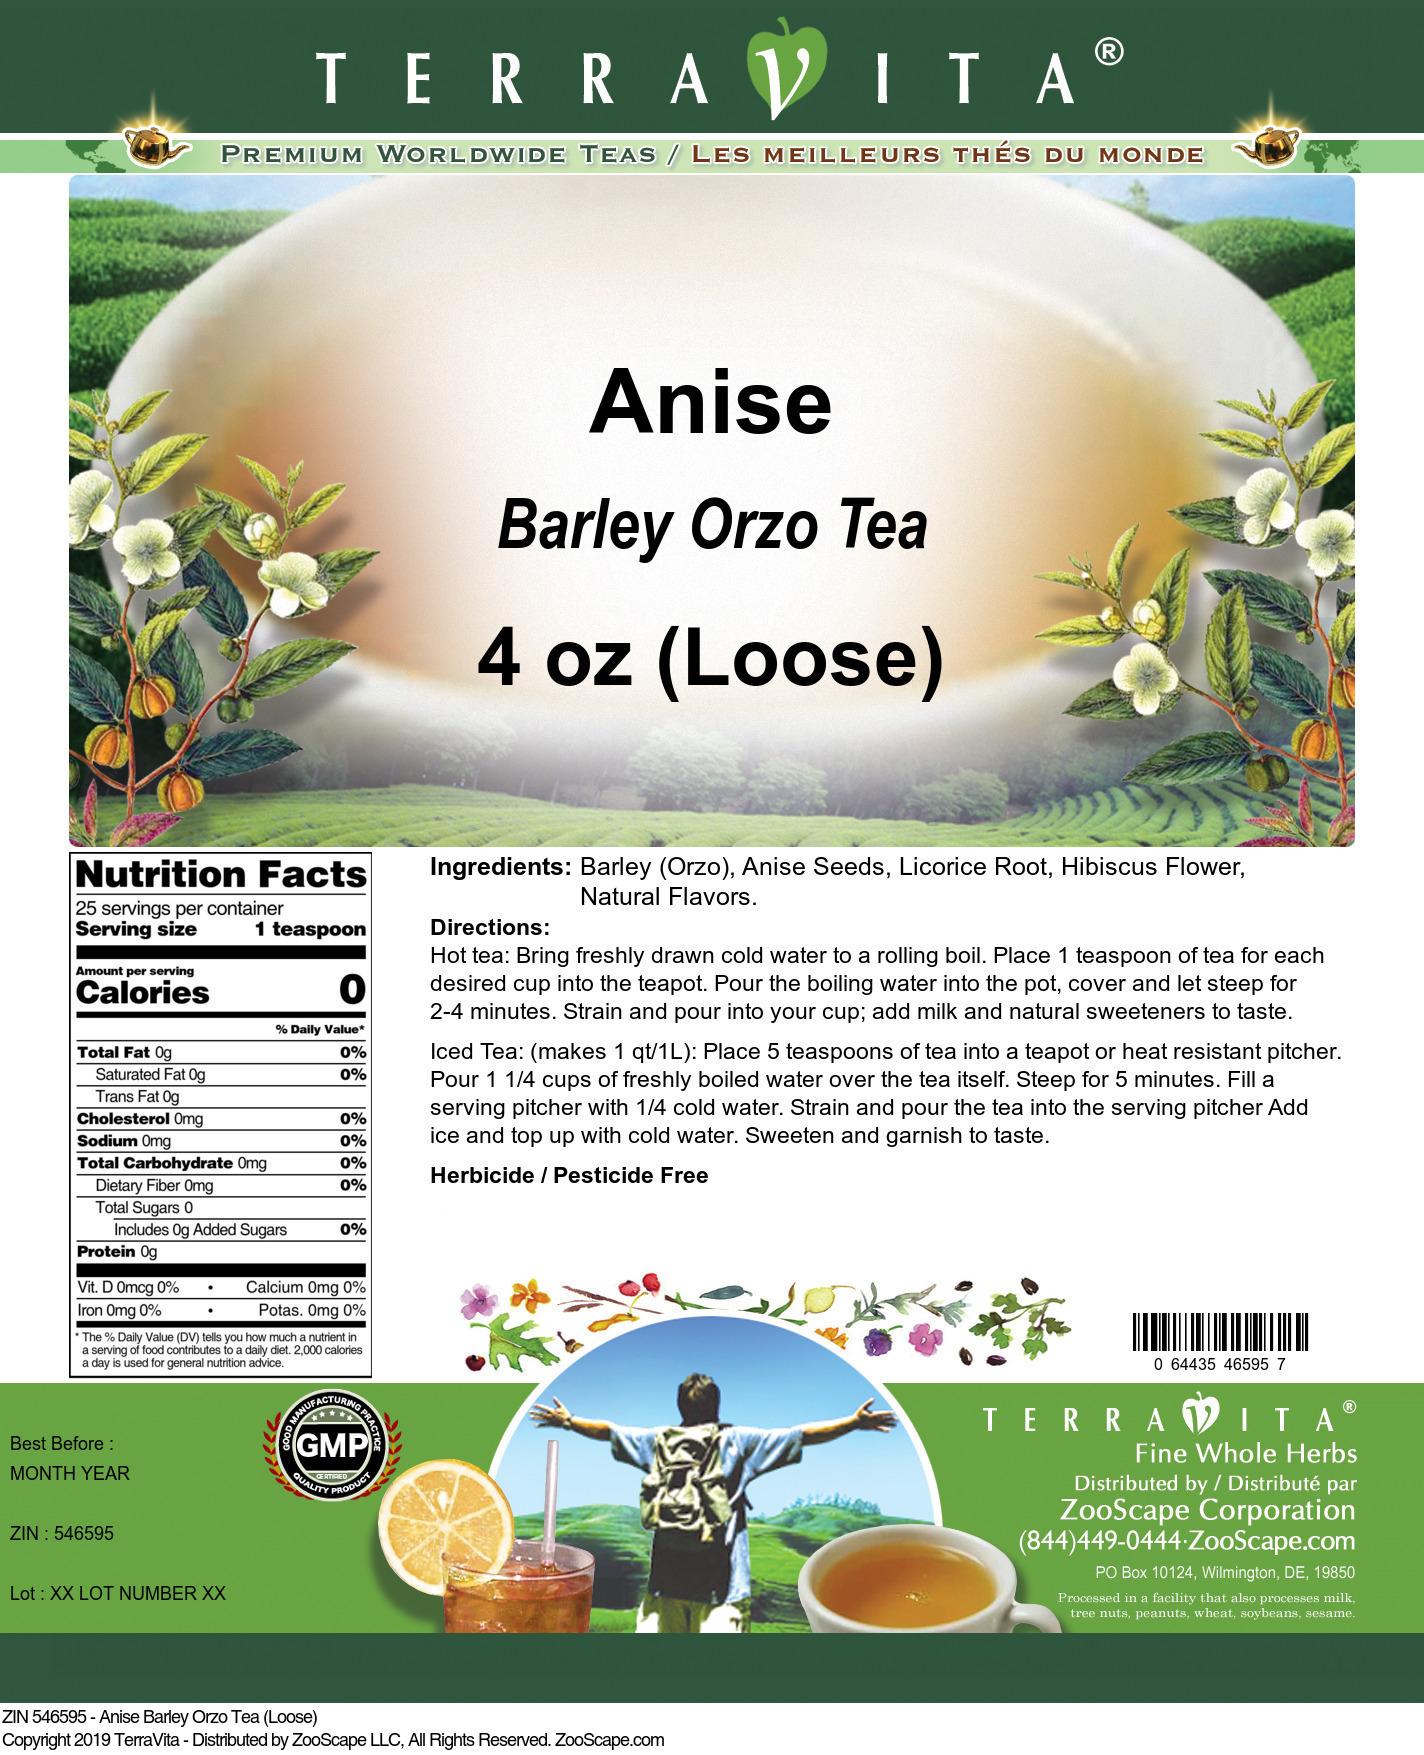 Anise Barley Orzo Tea (Loose)